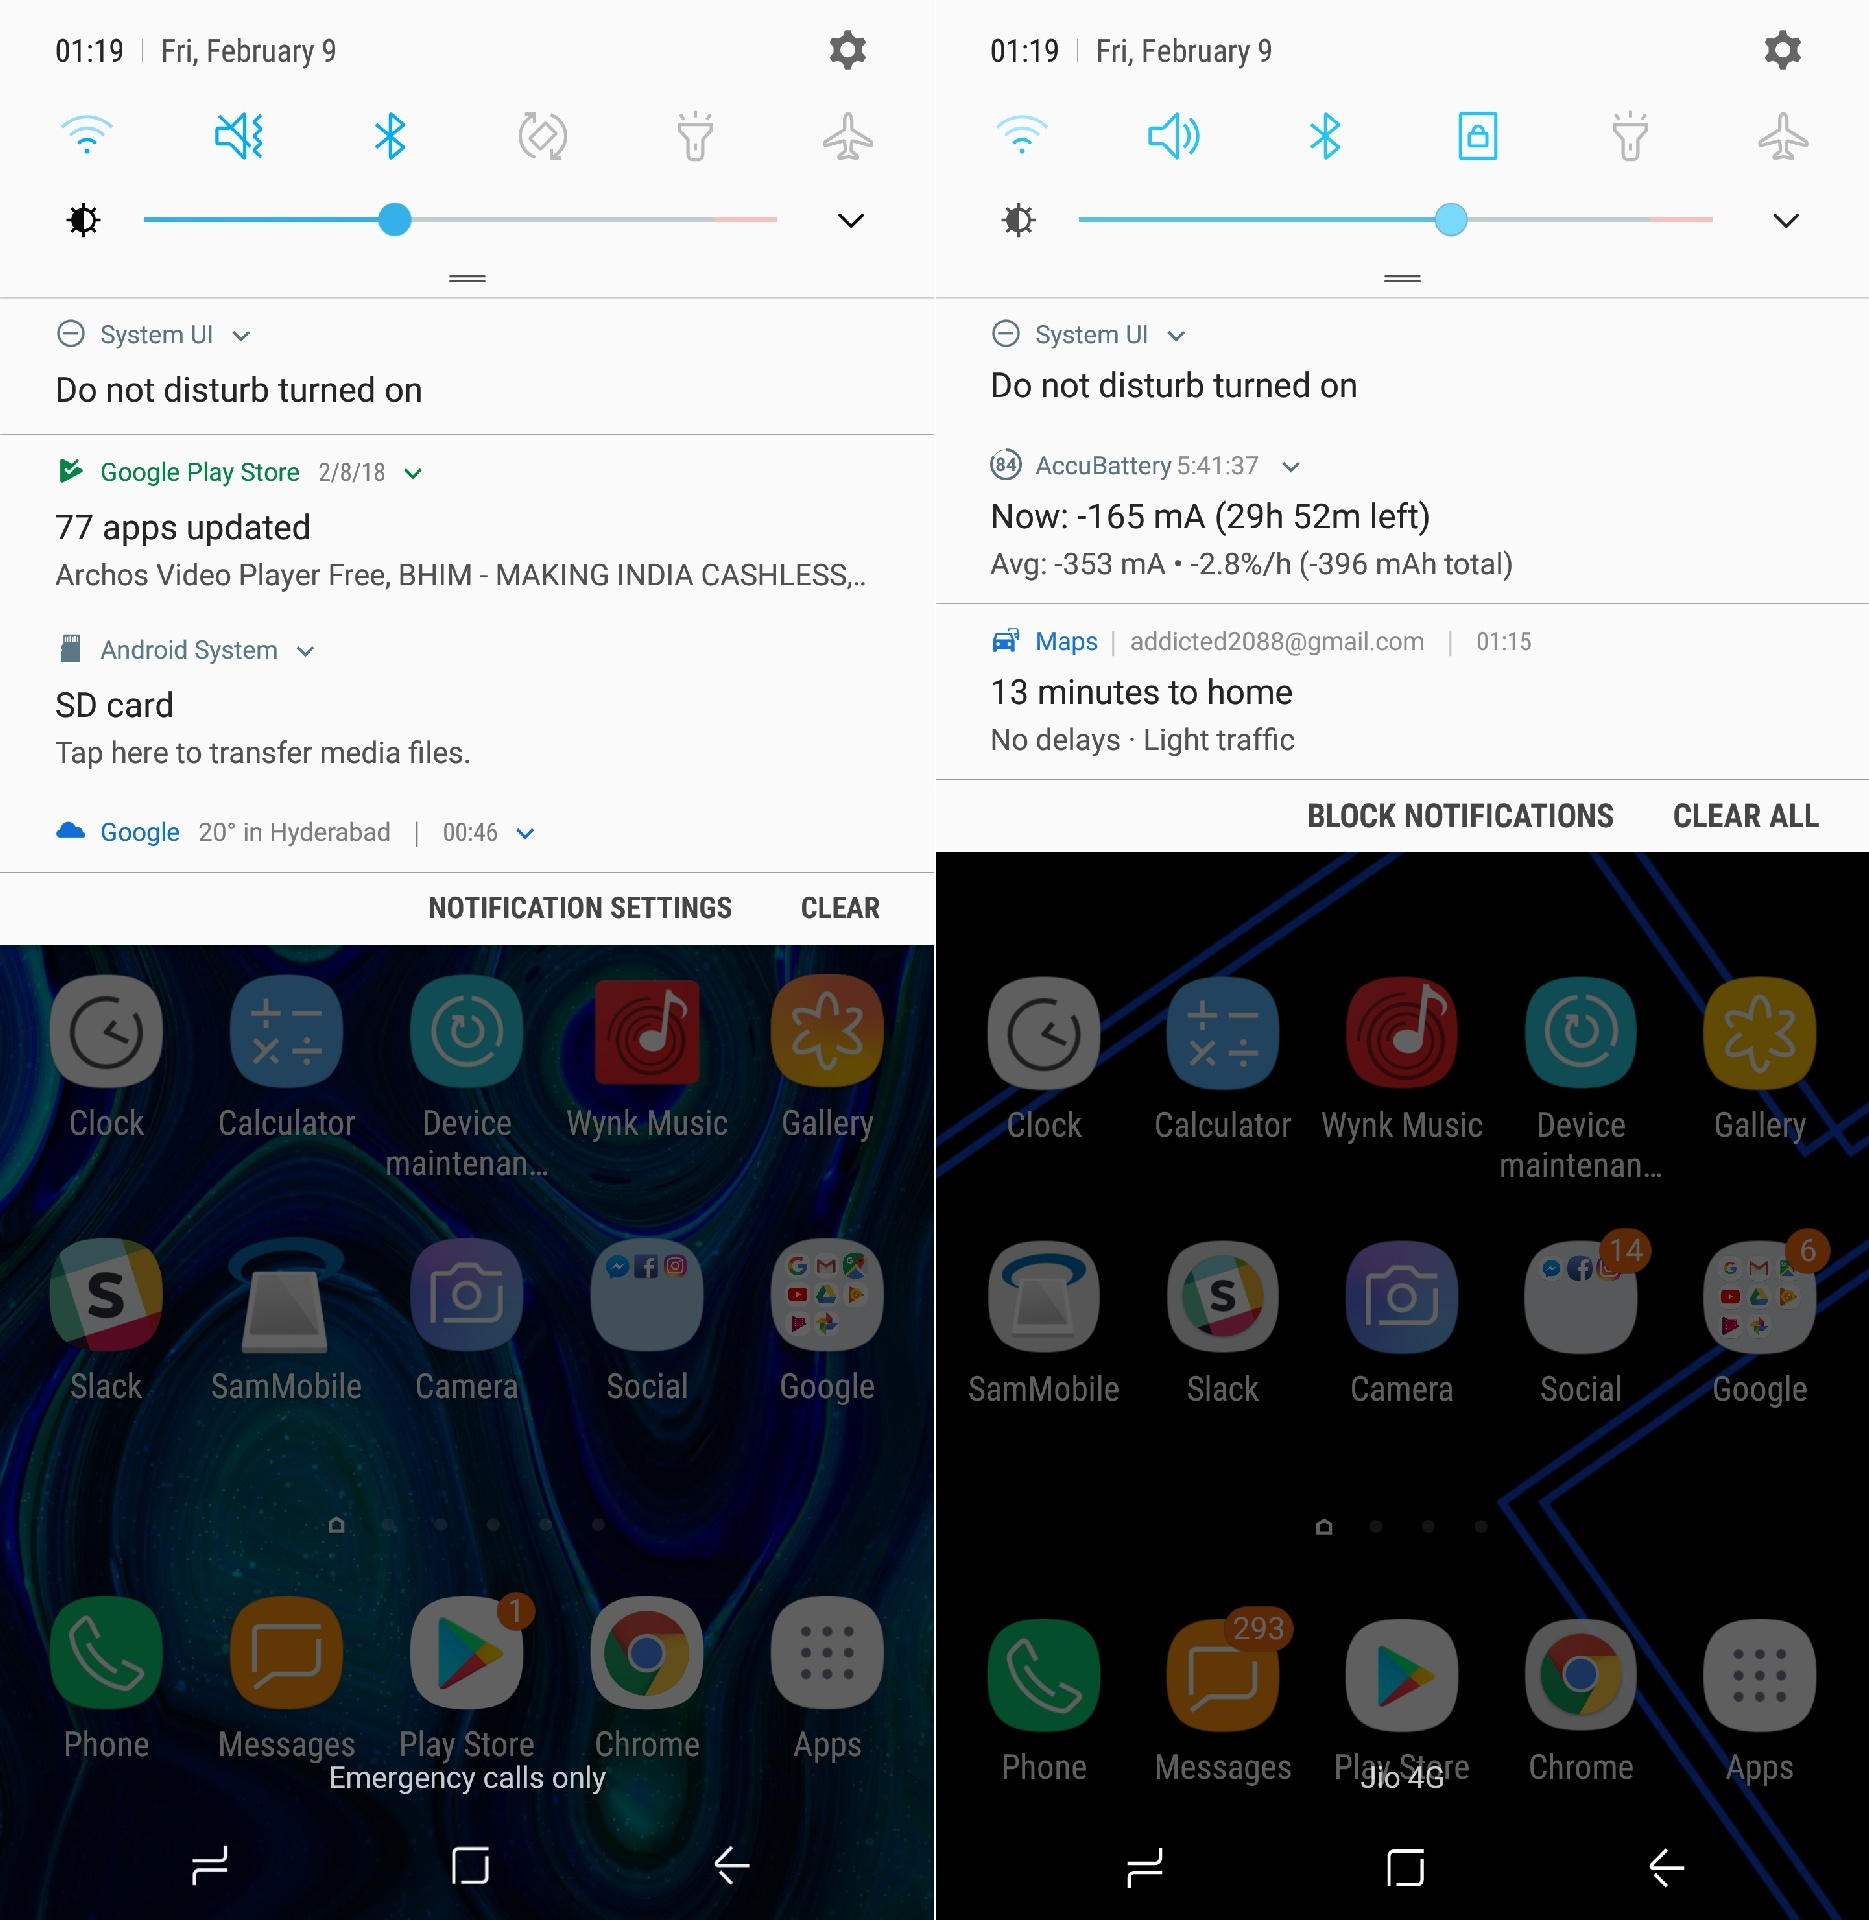 Galaxy S8 Oreo vs Nougat side-by-side screenshots - SamMobile